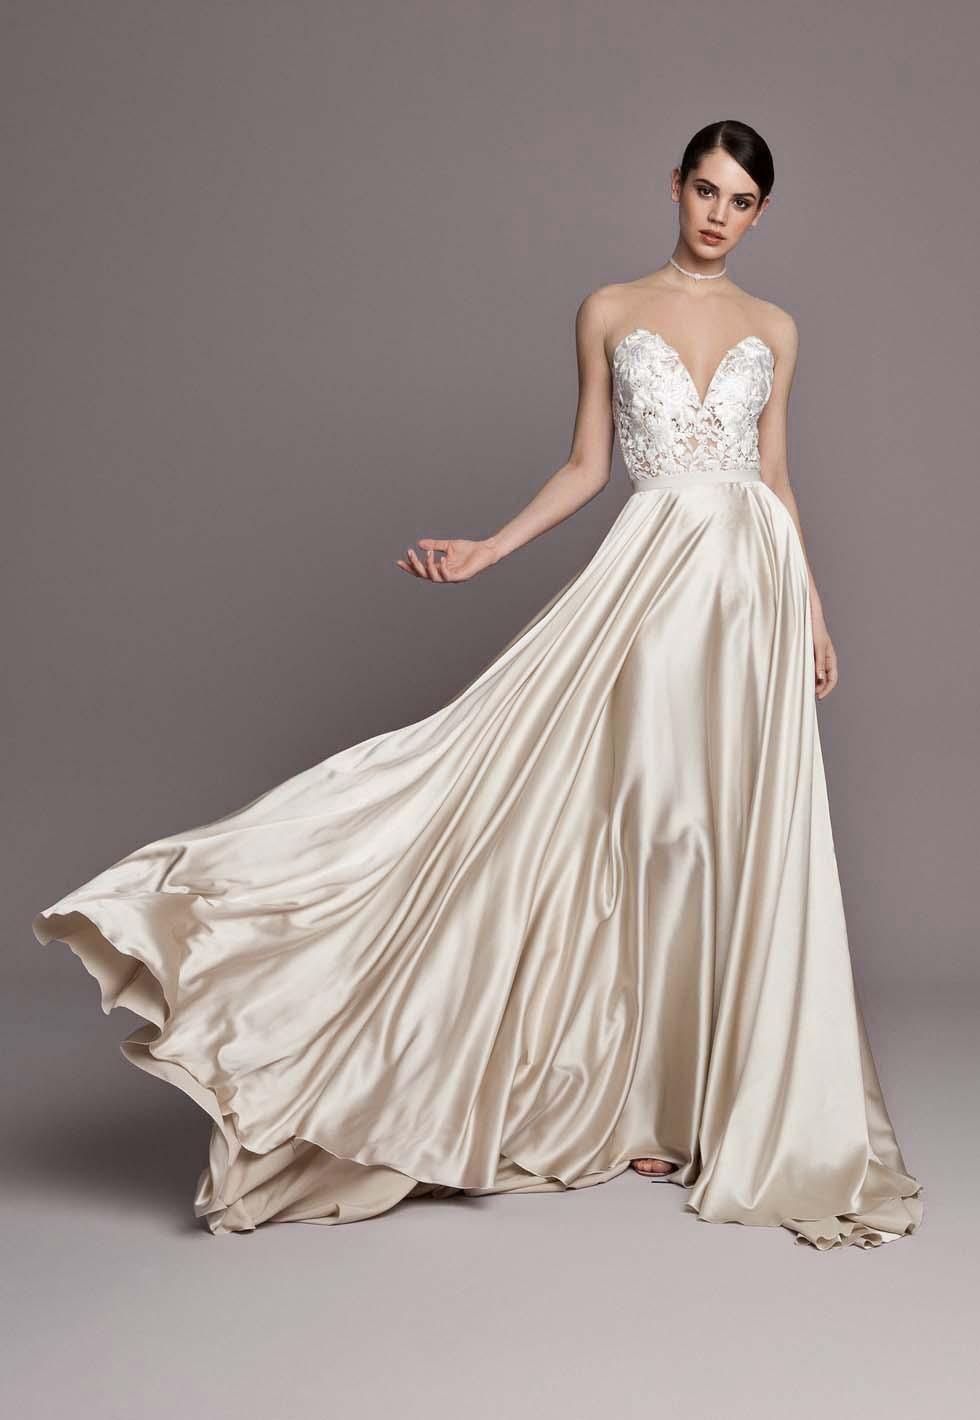 Brautkleid- Farbe Champagner Daarlana